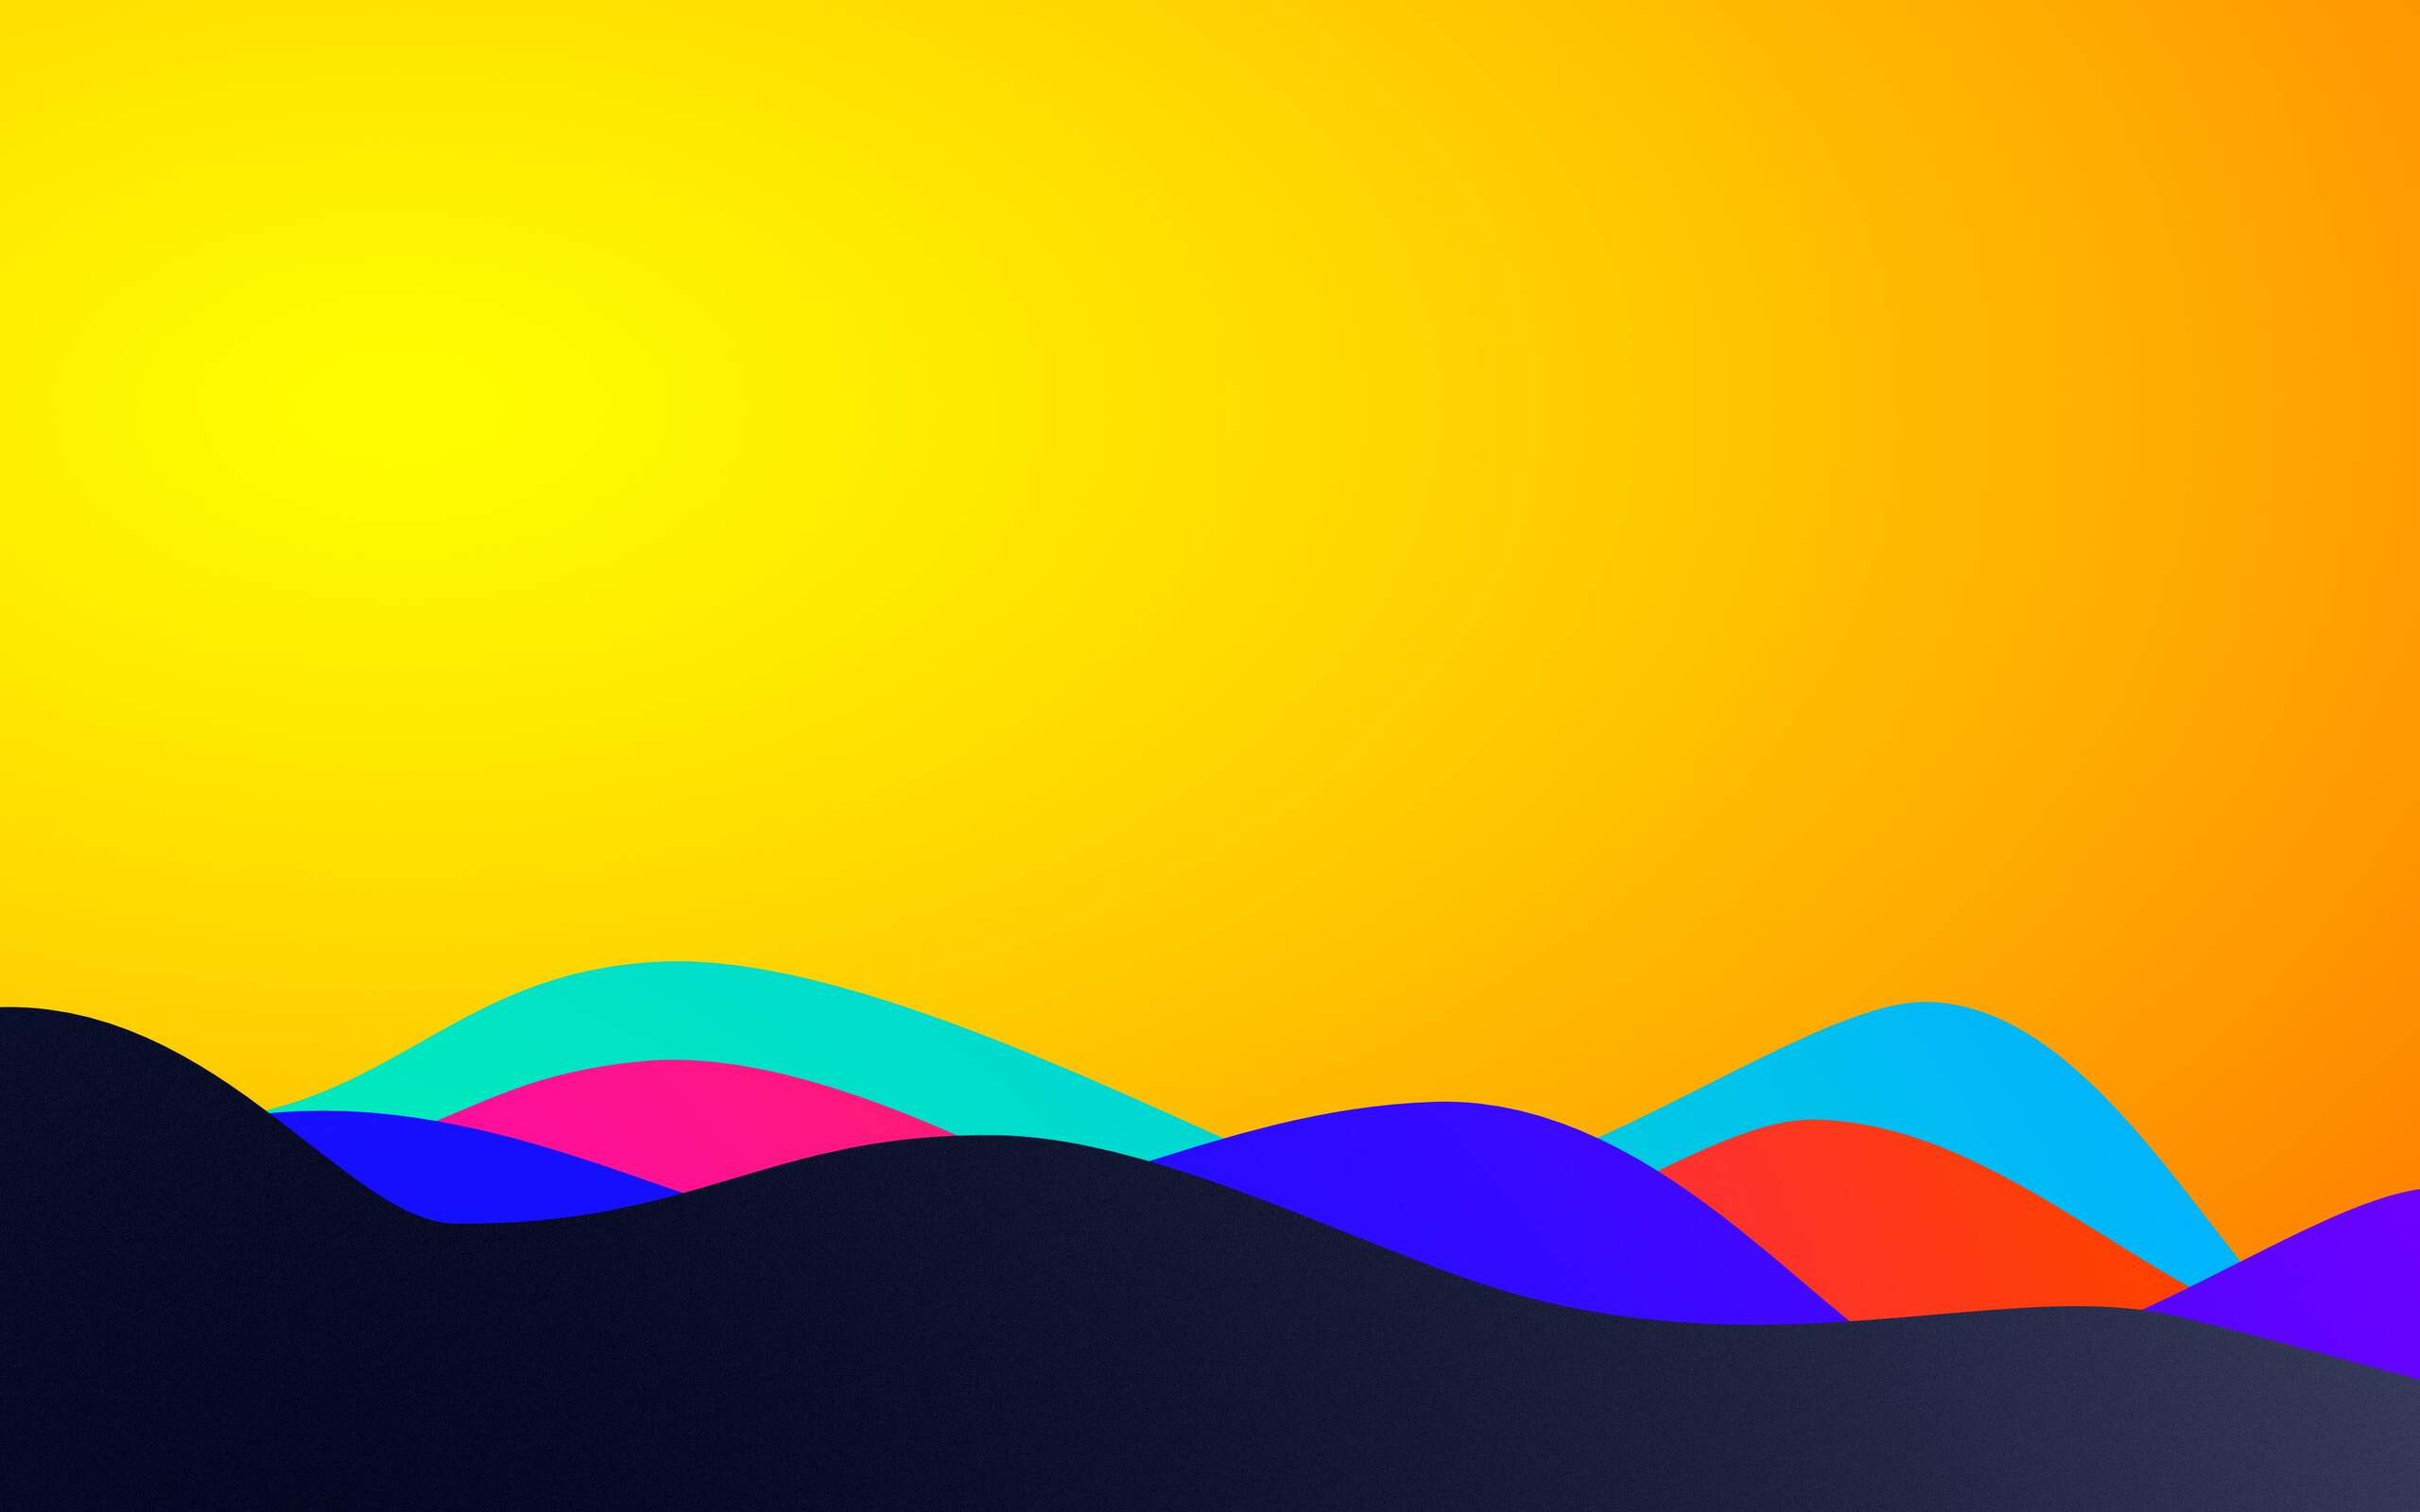 abstract-yellow-waves-4k-9l.jpg